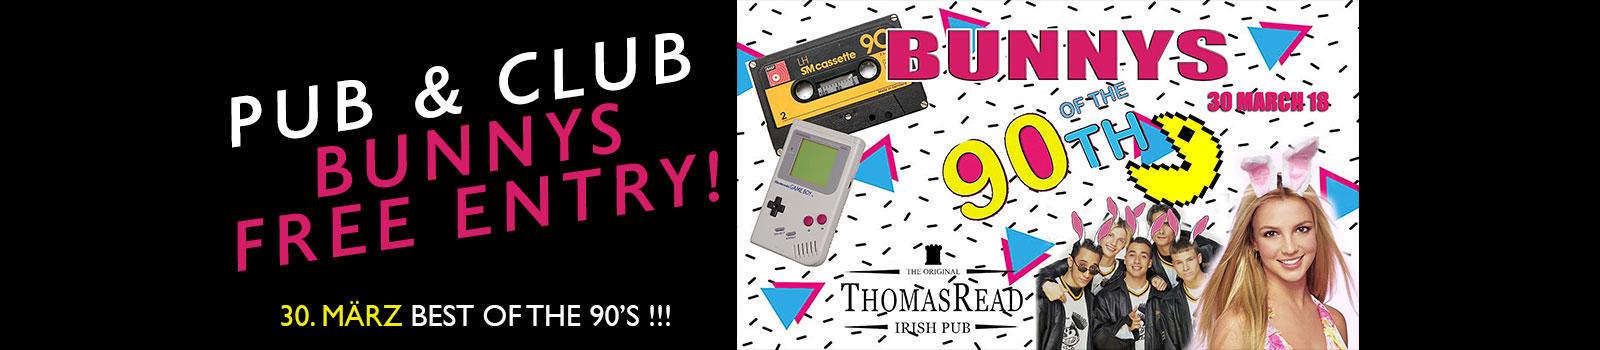 Website Slider Bunnys of the 90s